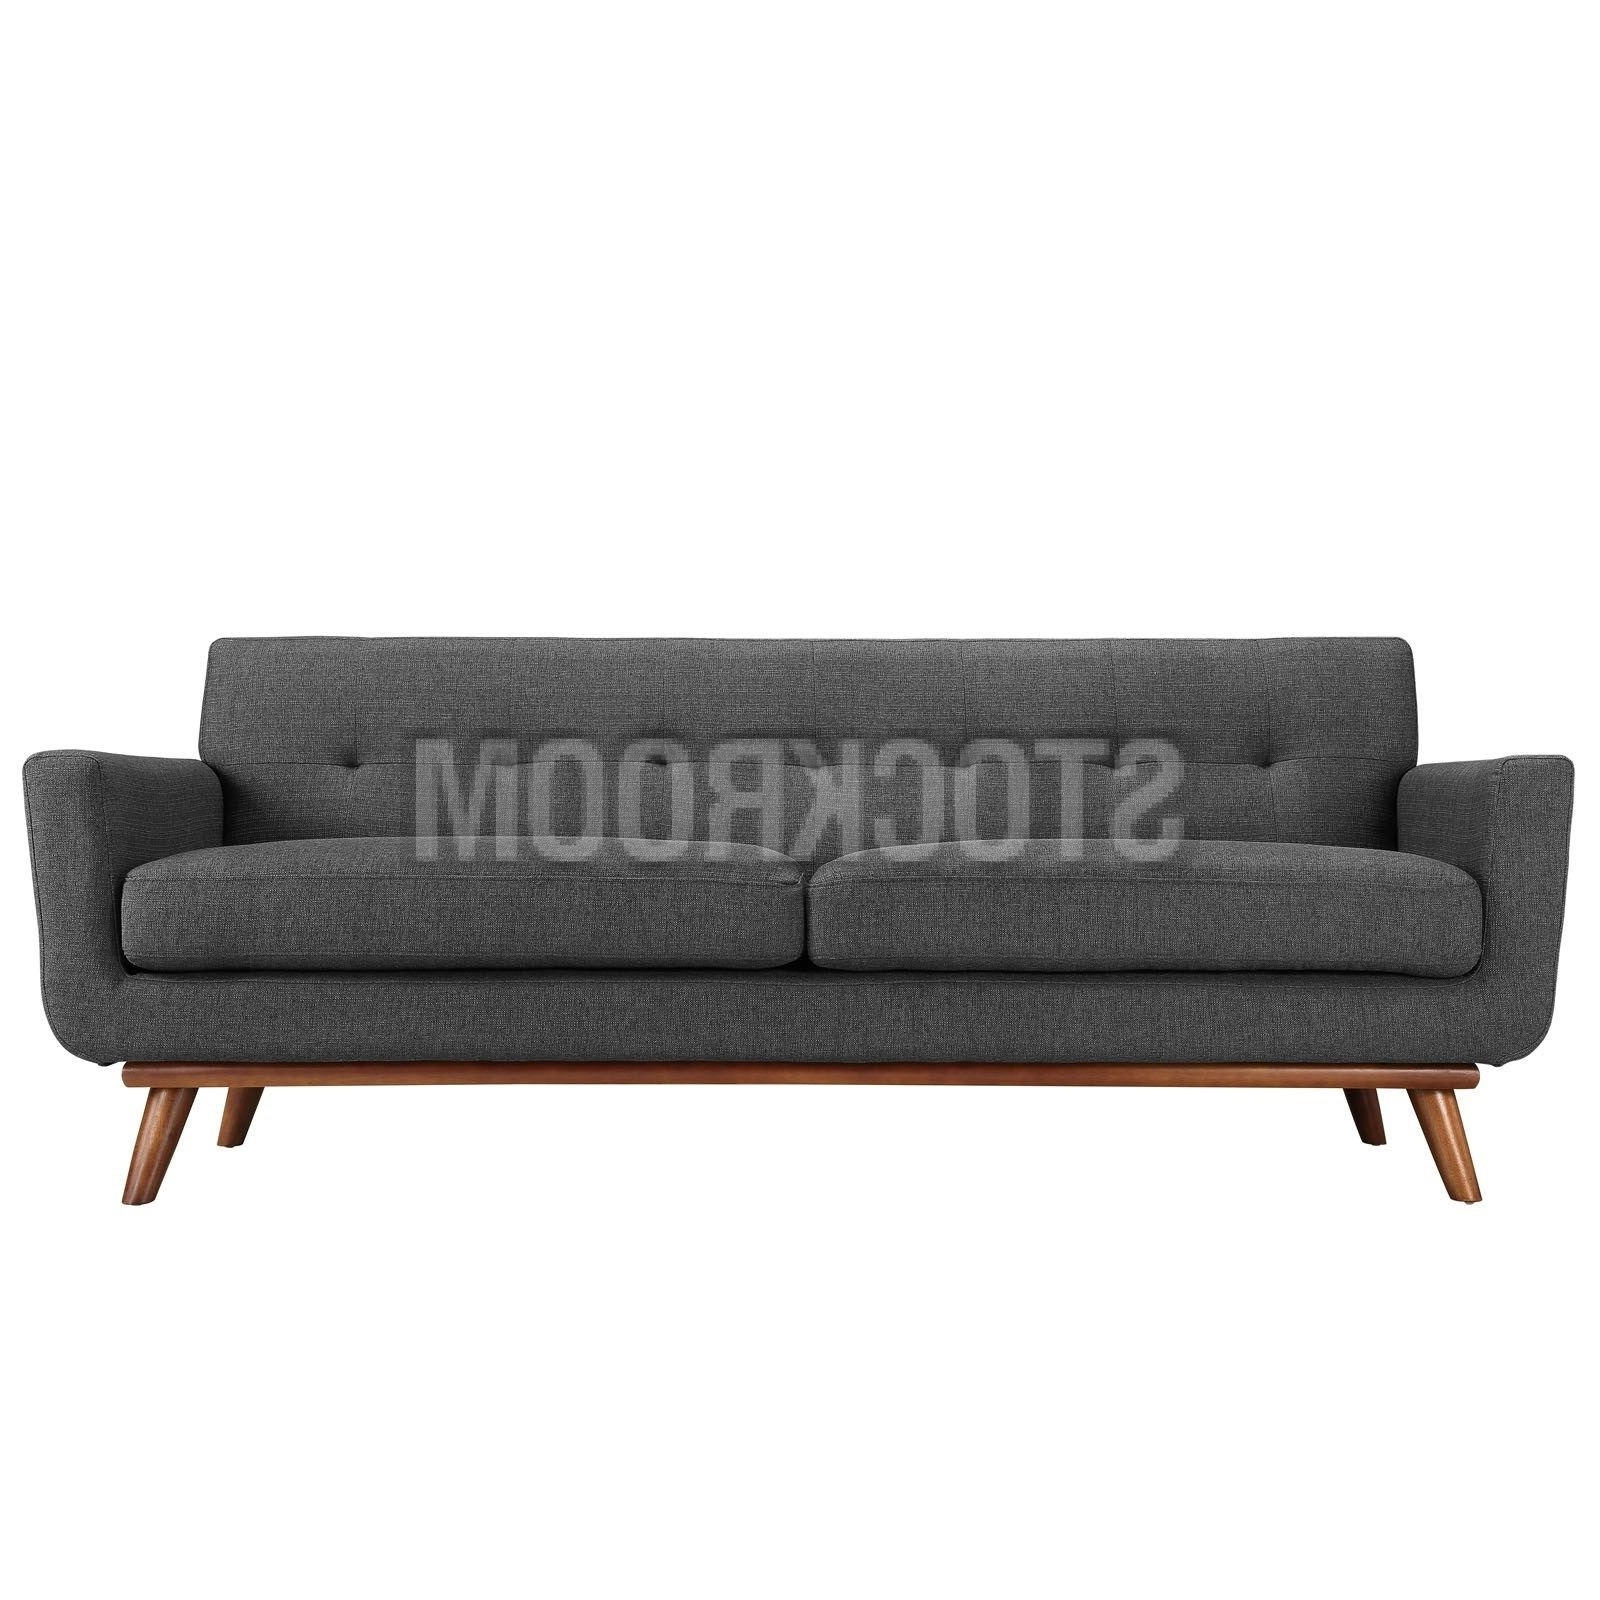 Aquarius Dark Grey Sofa Chairs With Preferred Aquarius Fabric Sofa 2 Seater : Stockroom Hong Kong Contemporary (Gallery 5 of 20)